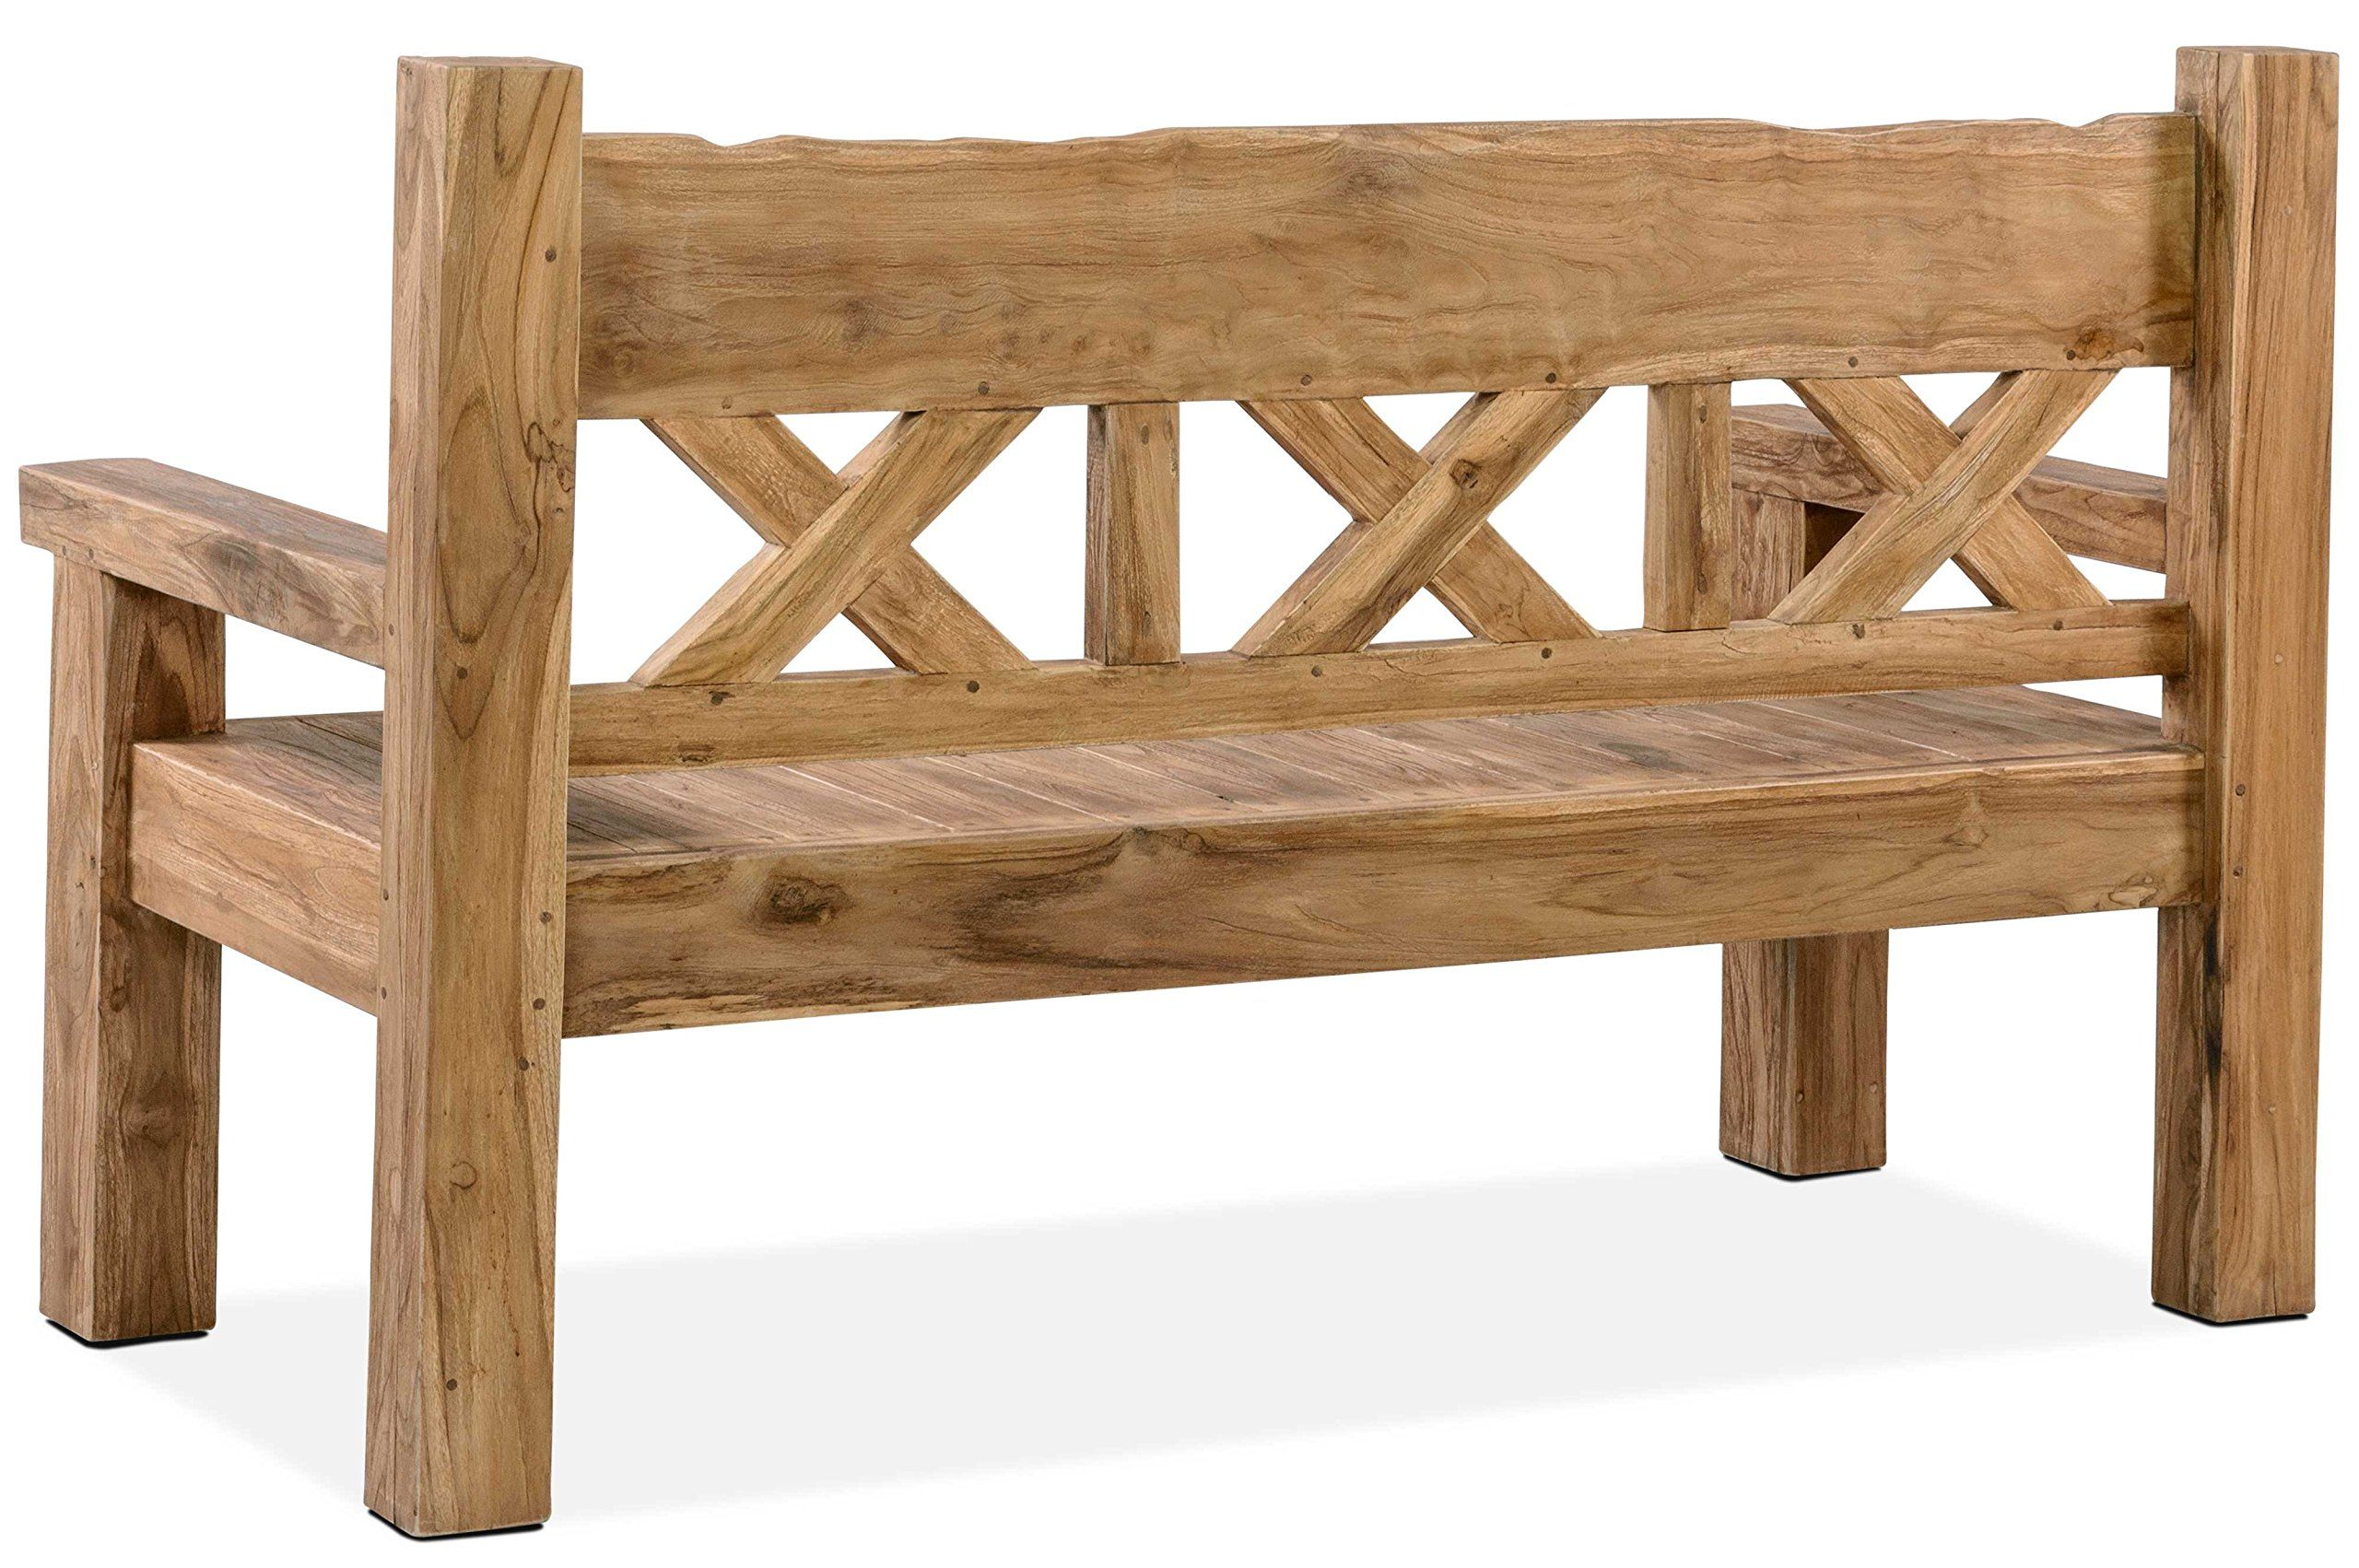 Amazon De Outflexx Gartenbank Grosse Sitz Bank In Natur Rustikal Geburstet Gartenbank Aus Teak Holz Holzbank Ca 160 In 2020 Wooden Bench Outdoor Wooden Bench Decor